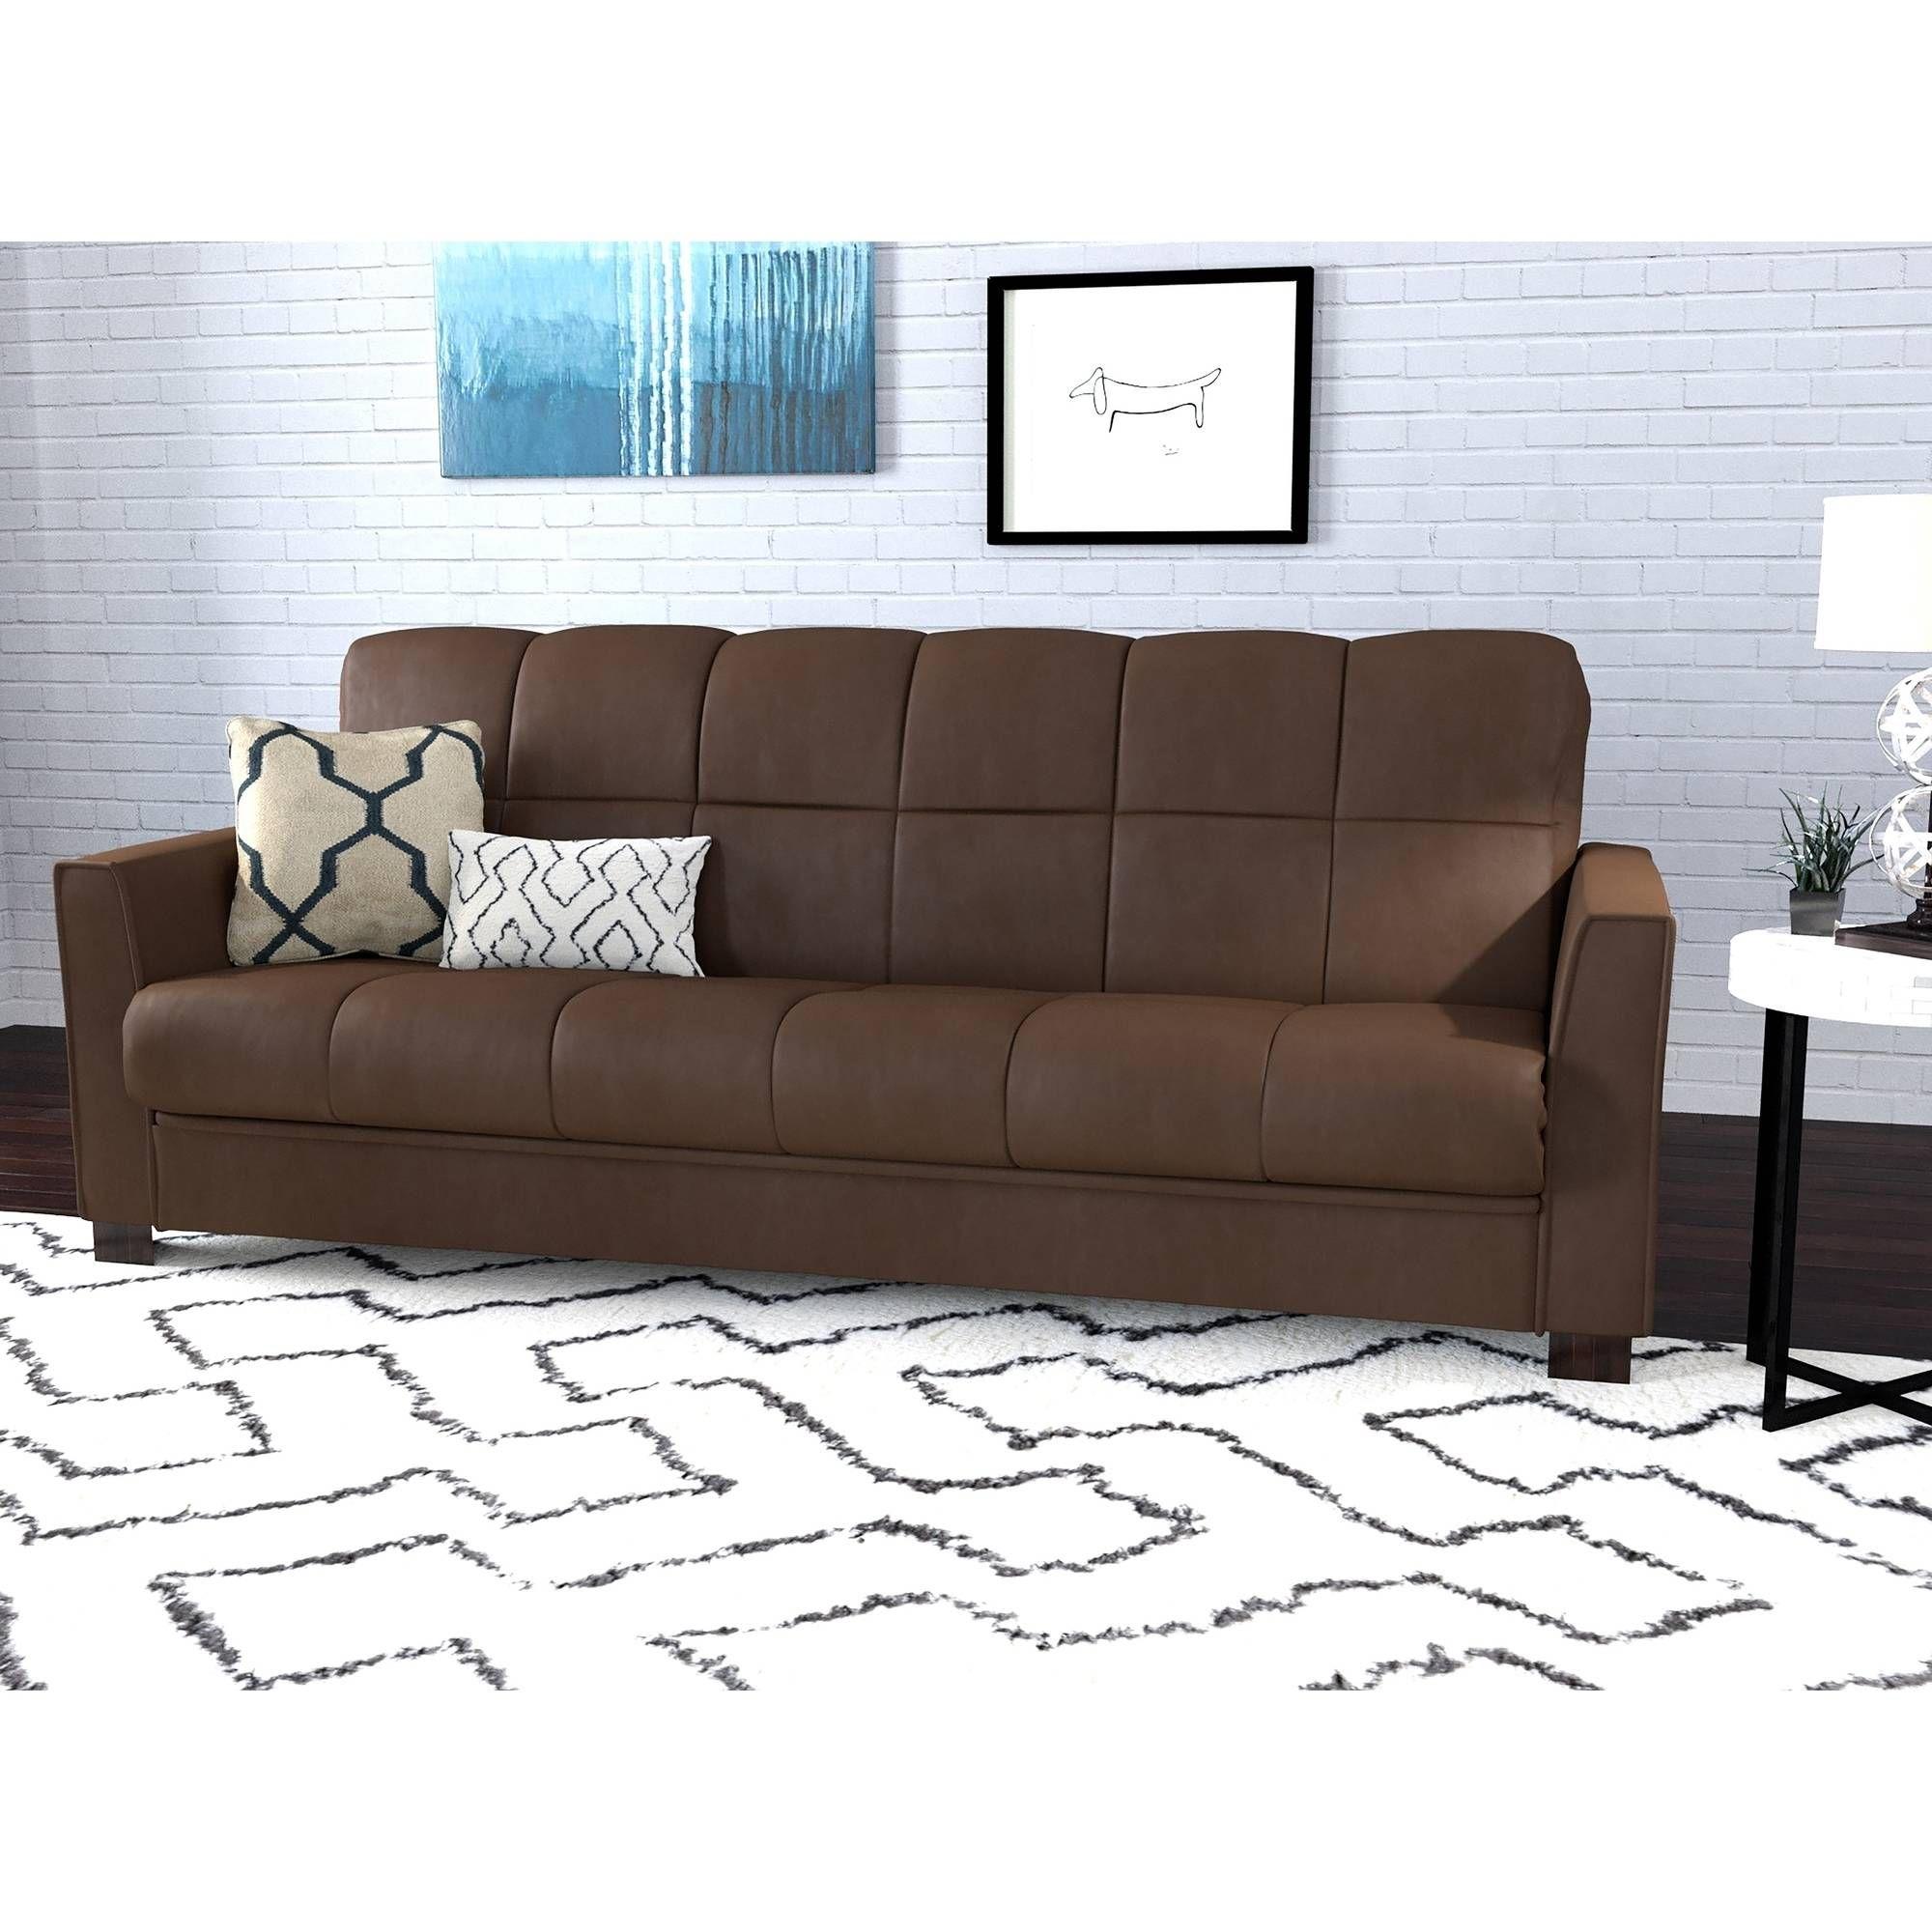 Awe Inspiring Mainstays Baja Microfiber Futon Sofa Sleeper Bed Multiple Ibusinesslaw Wood Chair Design Ideas Ibusinesslaworg